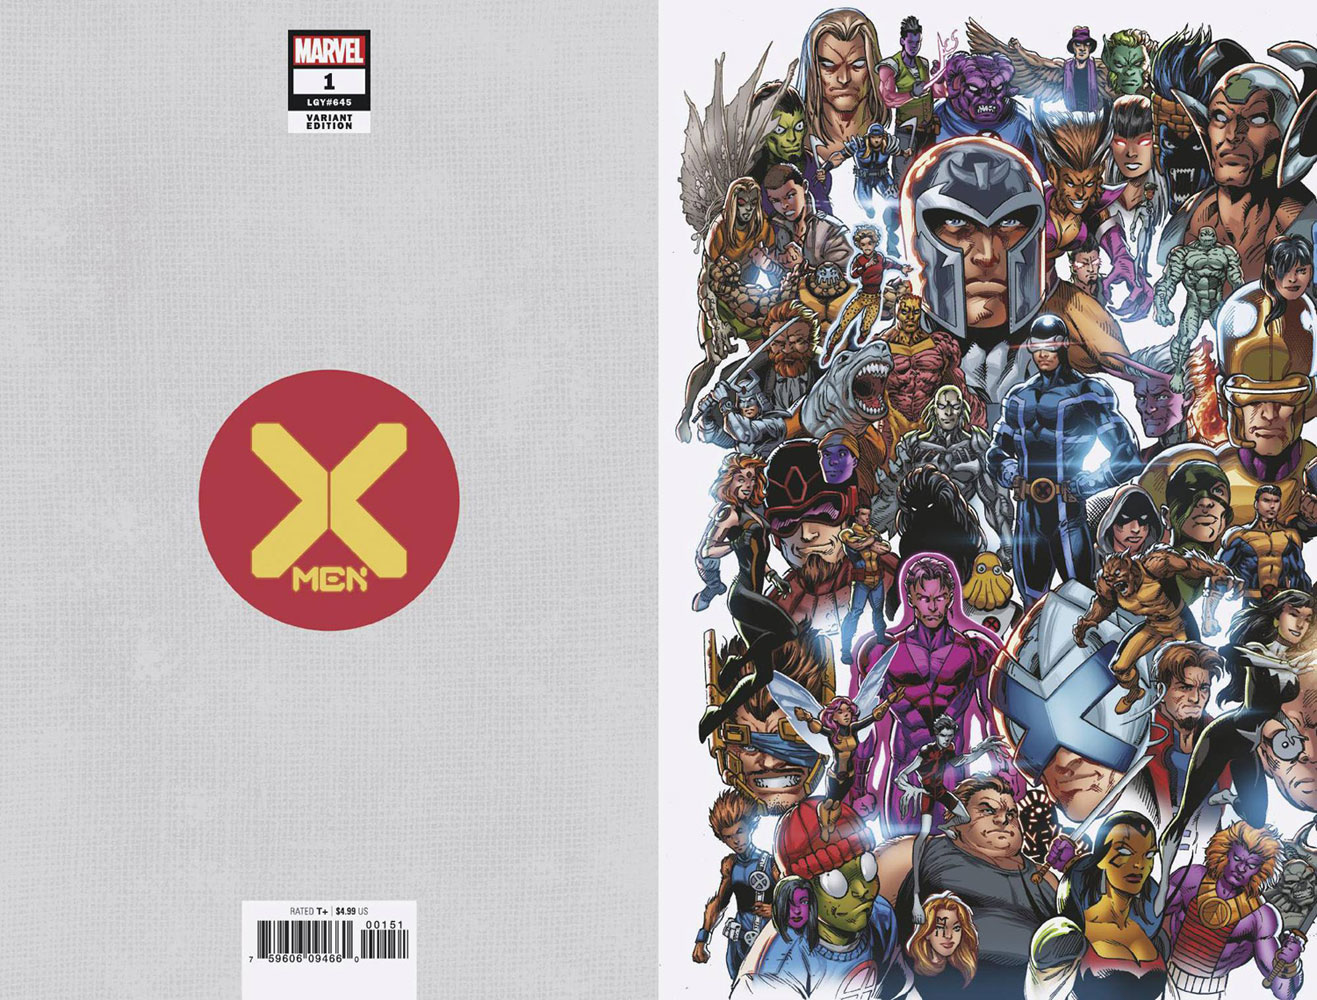 X-Men #1 (variant Every Mutant Ever cover - Bagley) - Marvel Comics